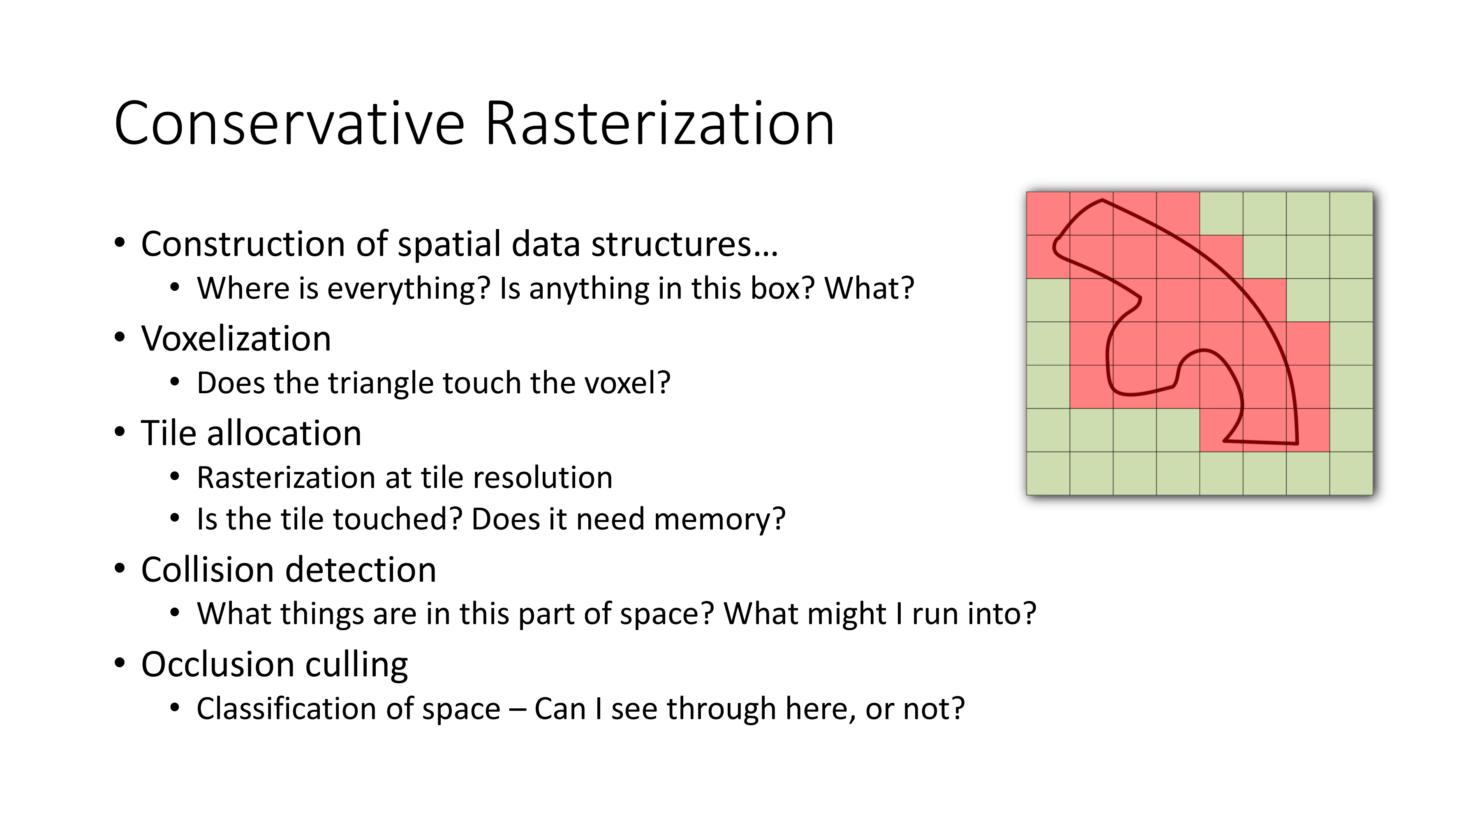 directx-12_conservative-rasterization